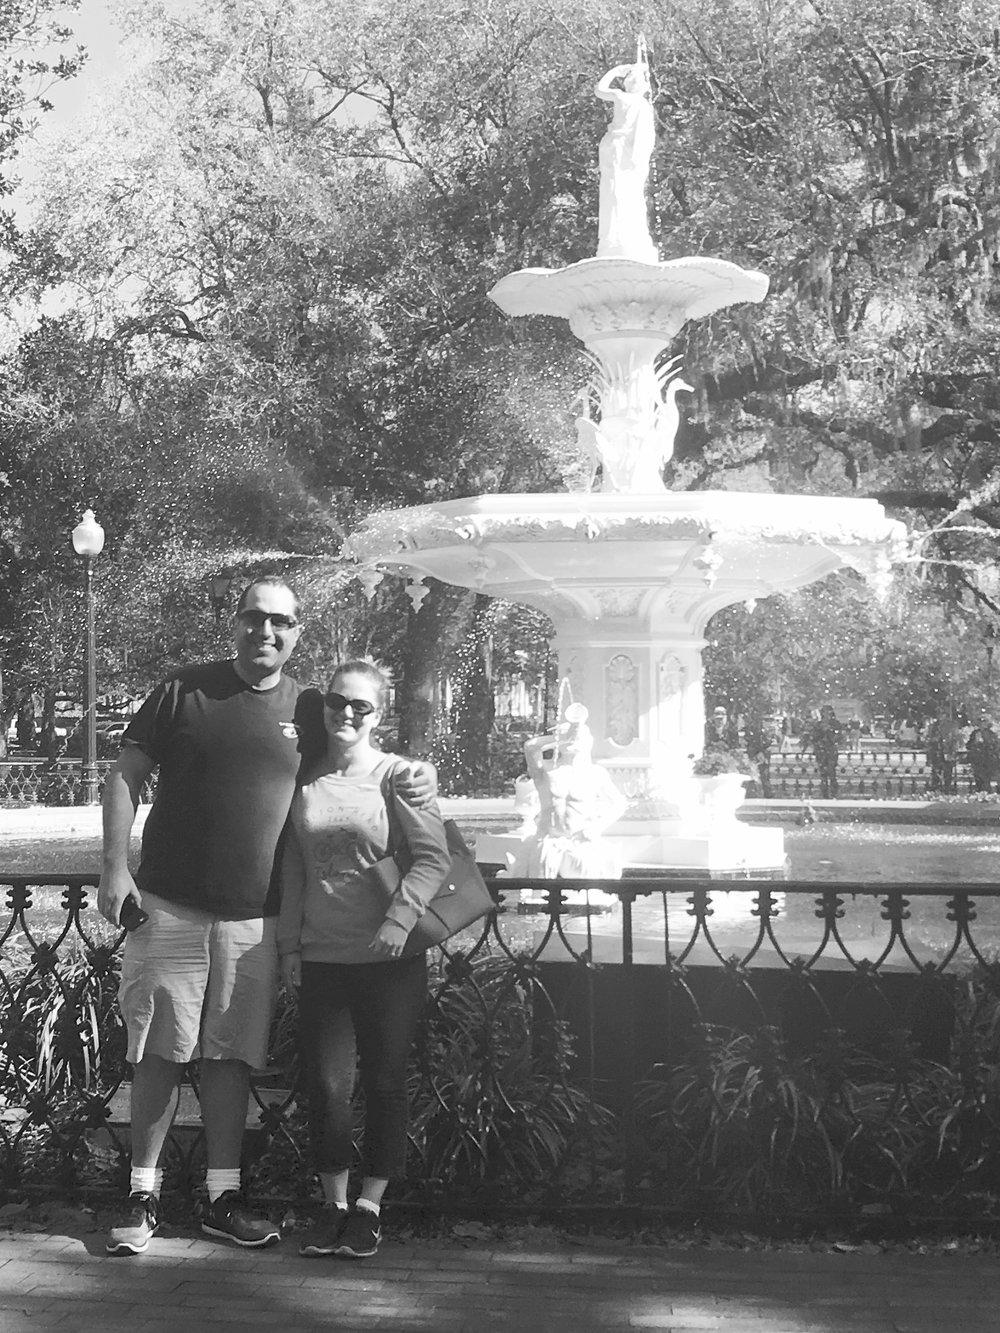 Our favorite spot in Savannah, Georgia